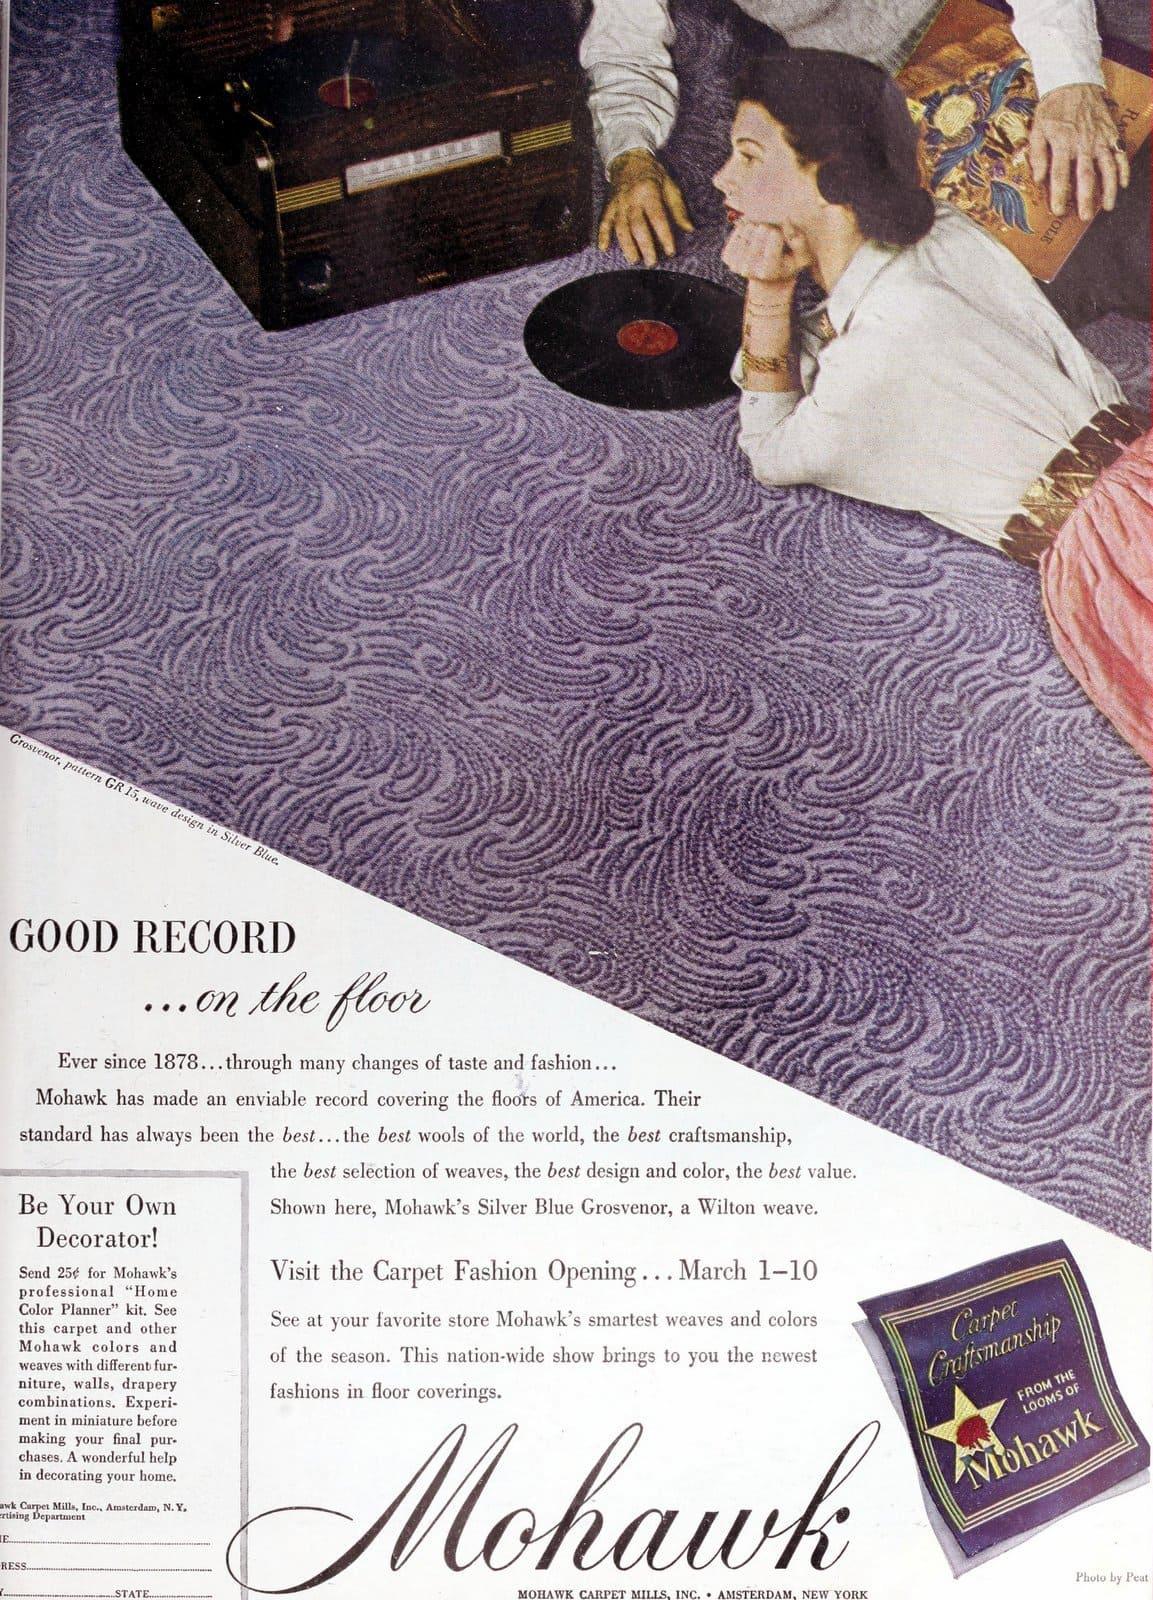 Vintage Mohawk textured carpet in purple (1949)